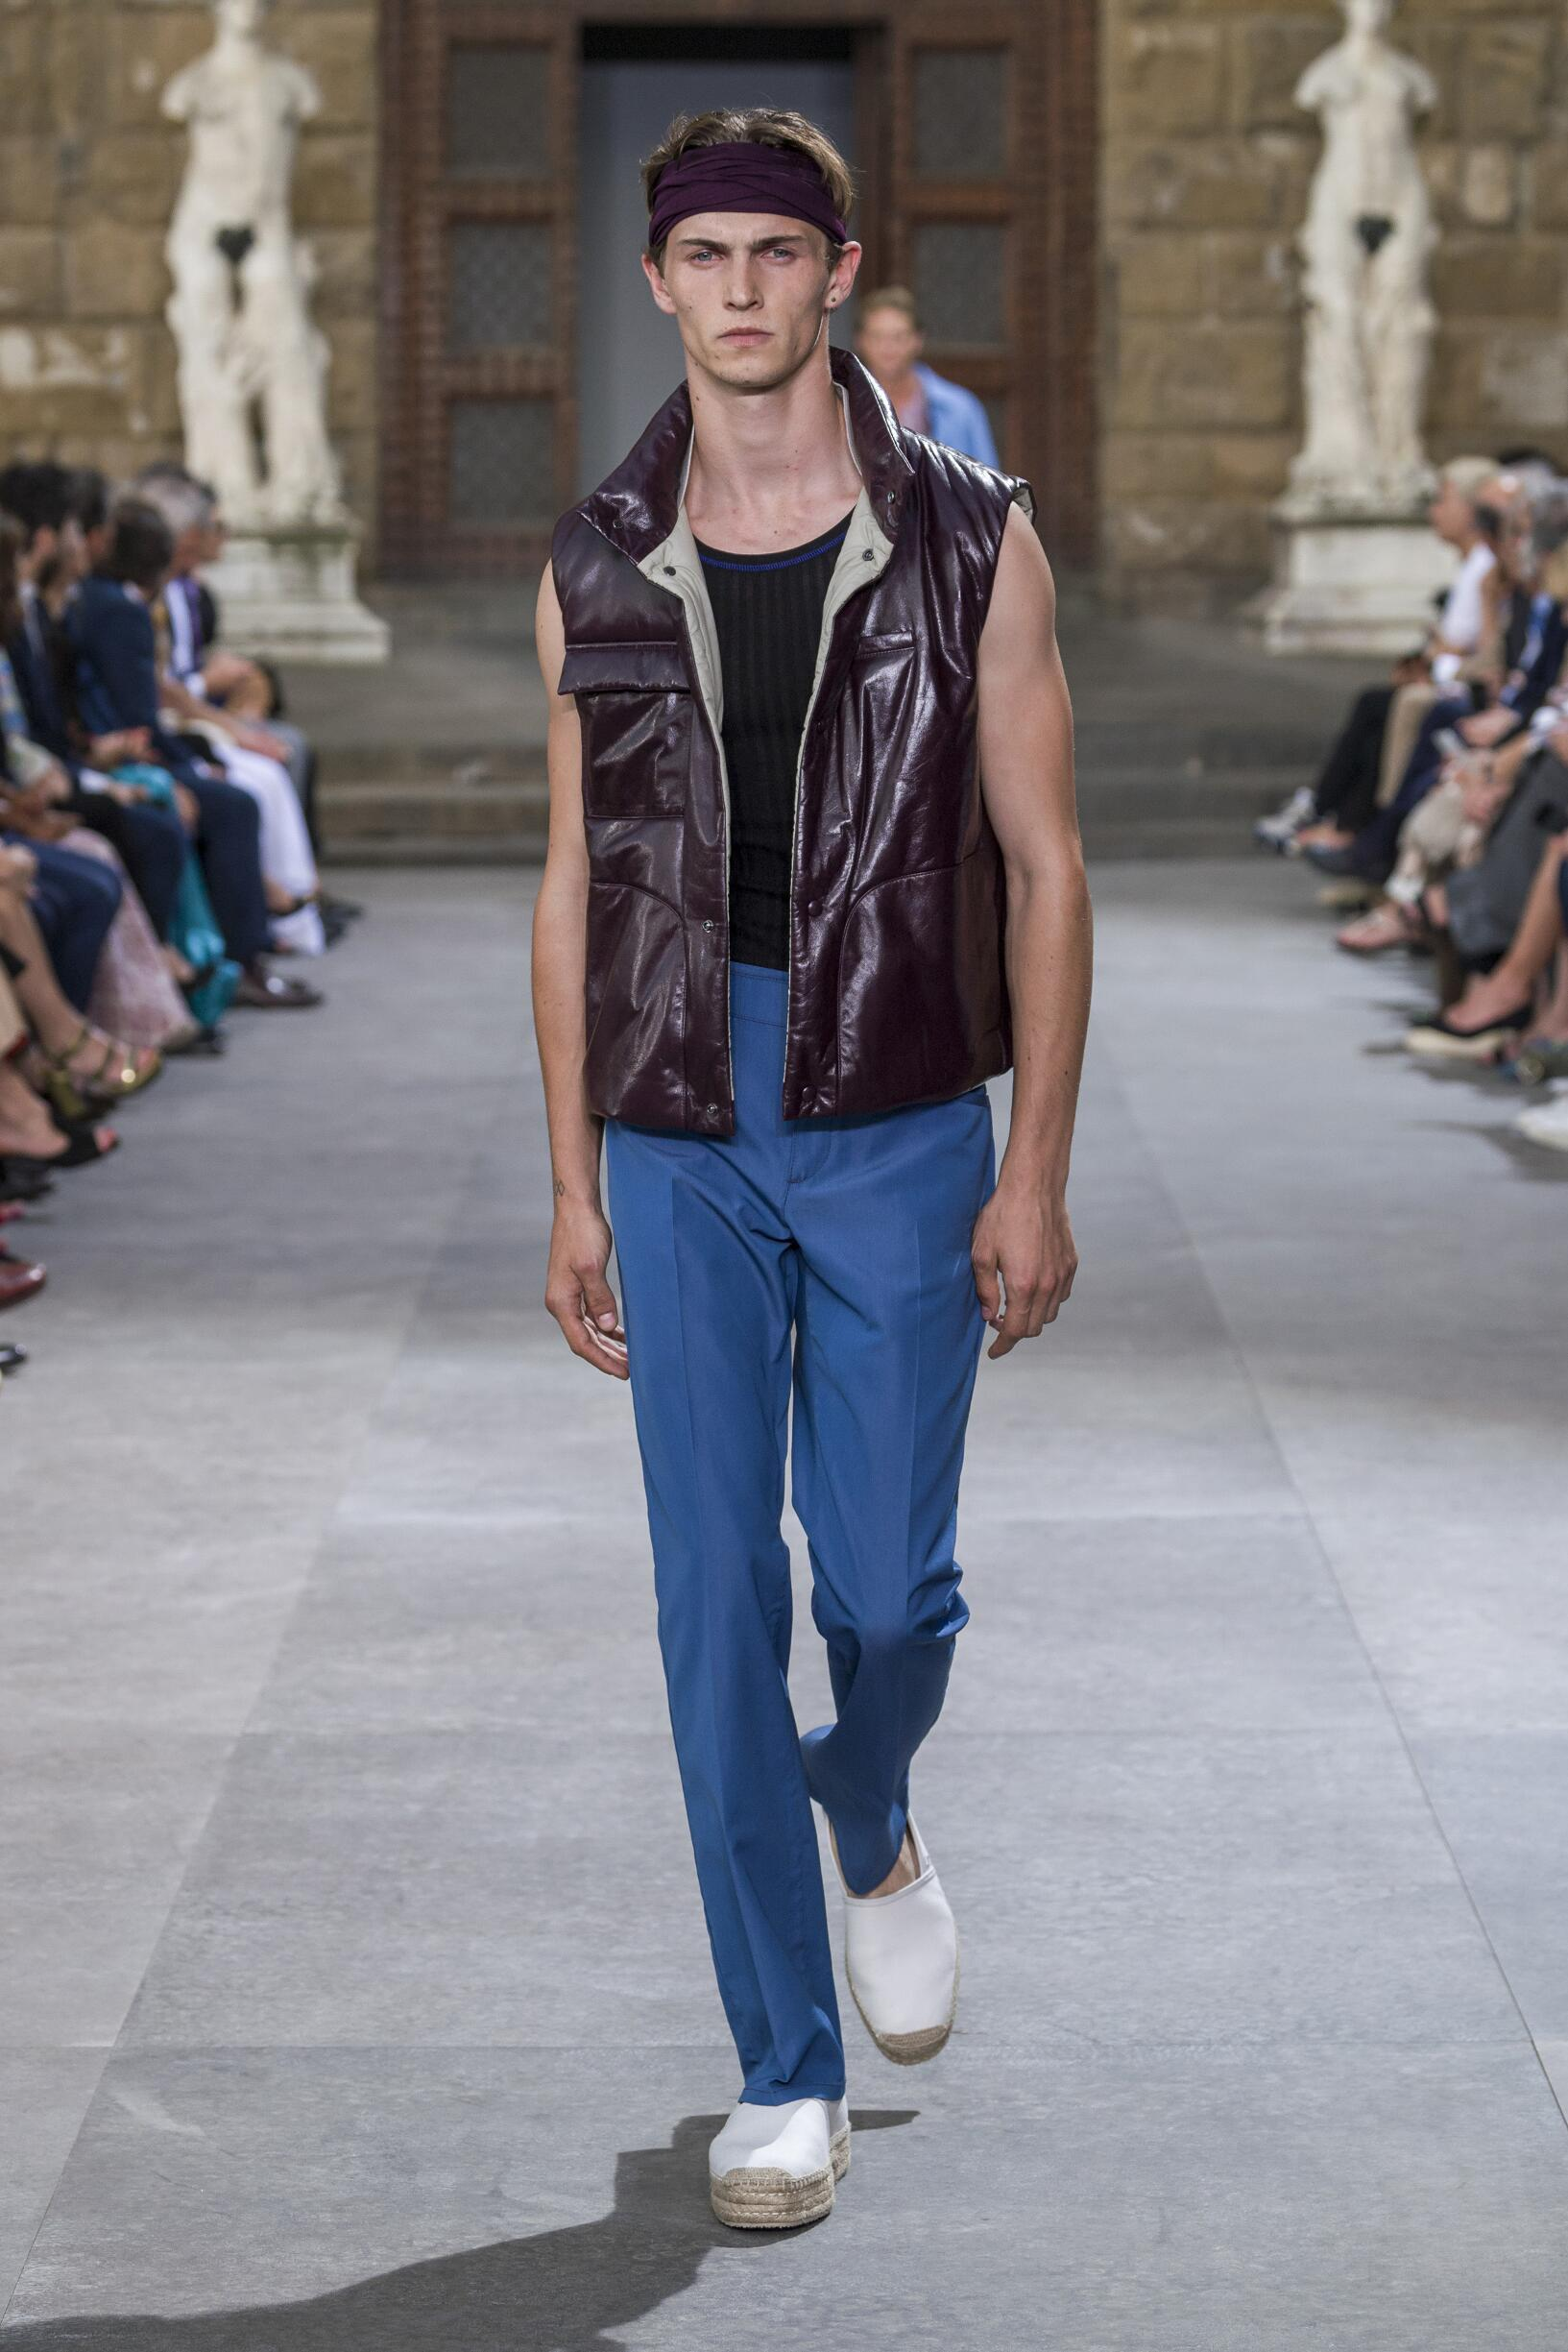 Salvatore Ferragamo Summer 2020 Catwalk